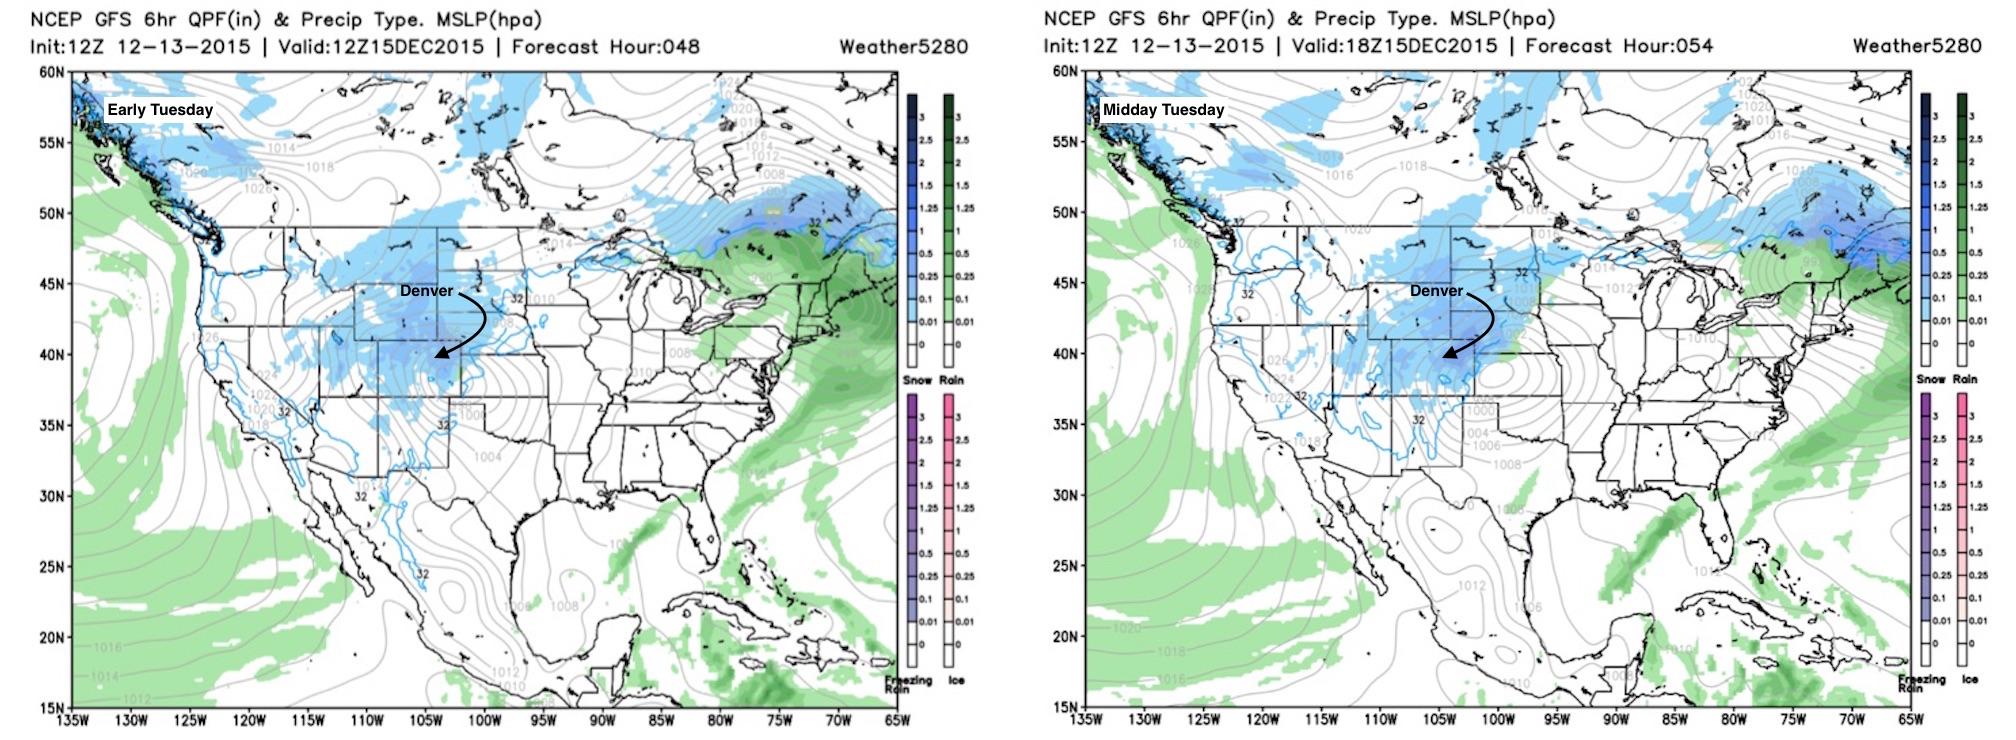 GFS precip + MSLP forecast | Weather5280 Models